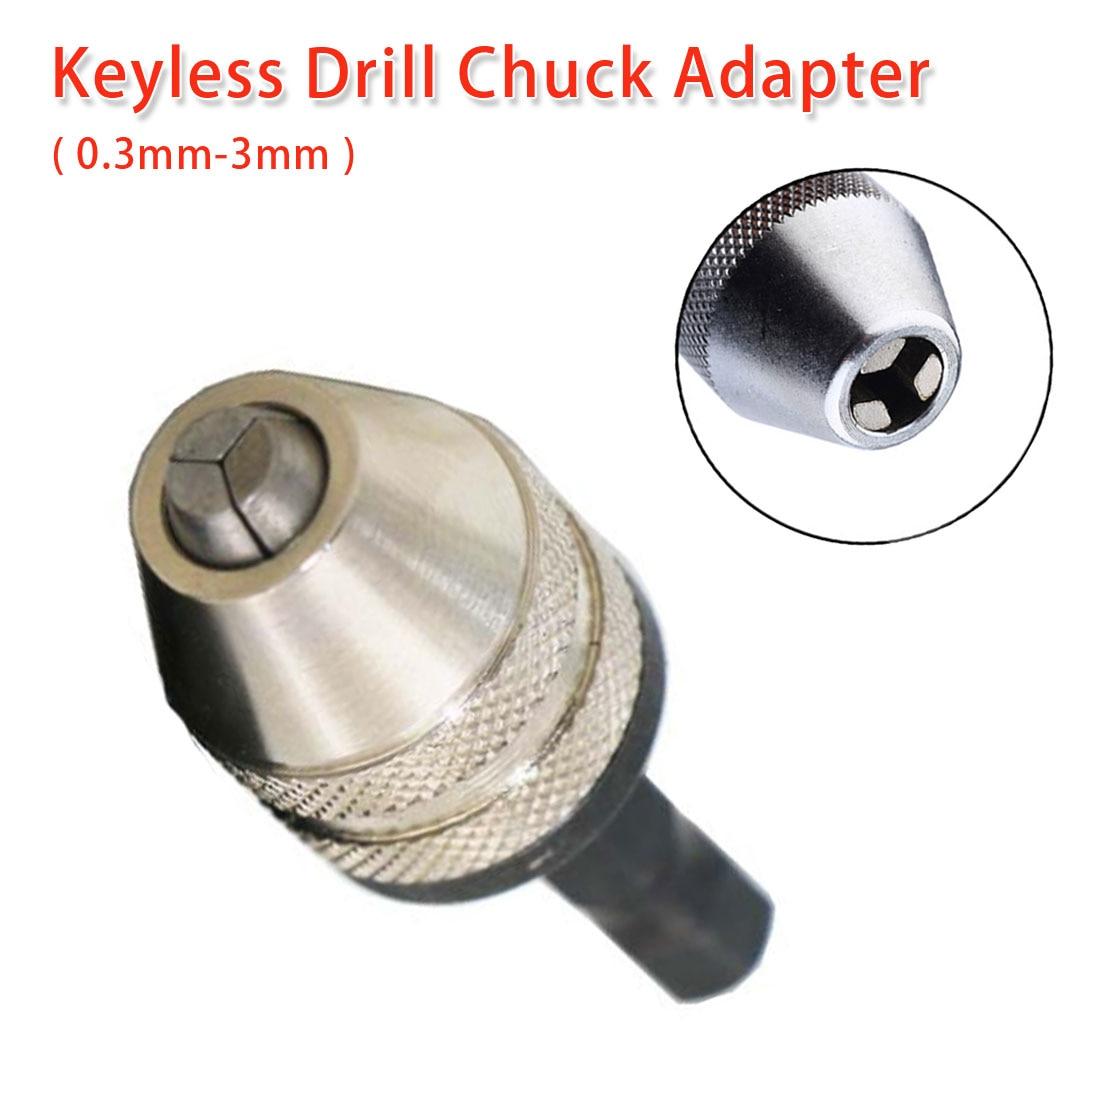 Screwdriver Impact Driver Adaptor 0.3-3mm Keyless Drill Chuck Adapter Hex Shank Drill Bit Tool Shaft Chuck For Electric Grinder